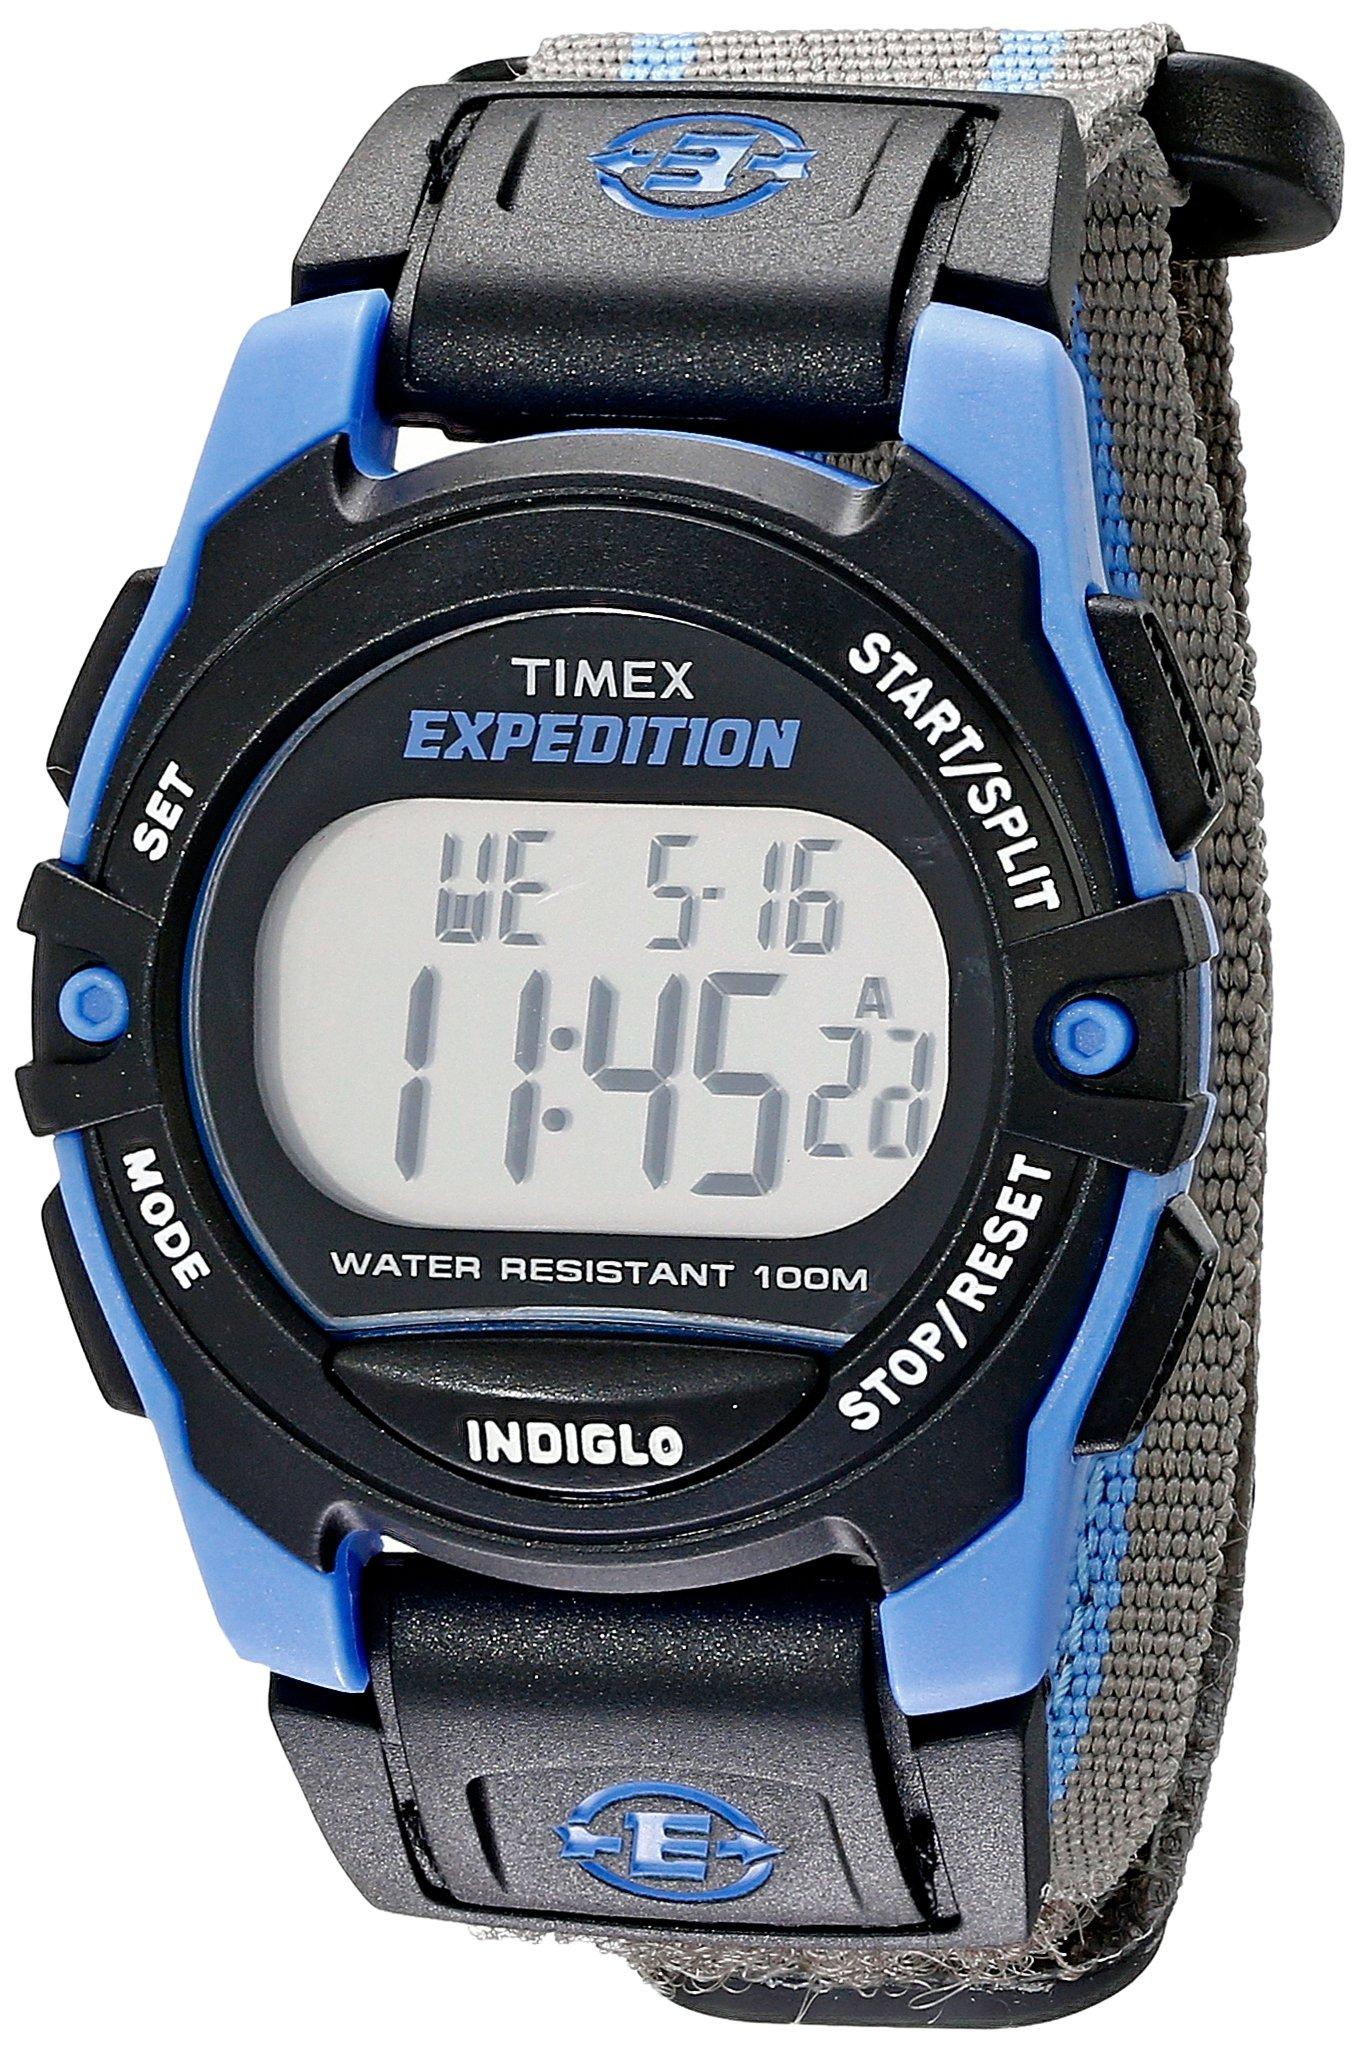 Timex Expedition Digital Chrono Alarm Timer 33mm Watch by Timex